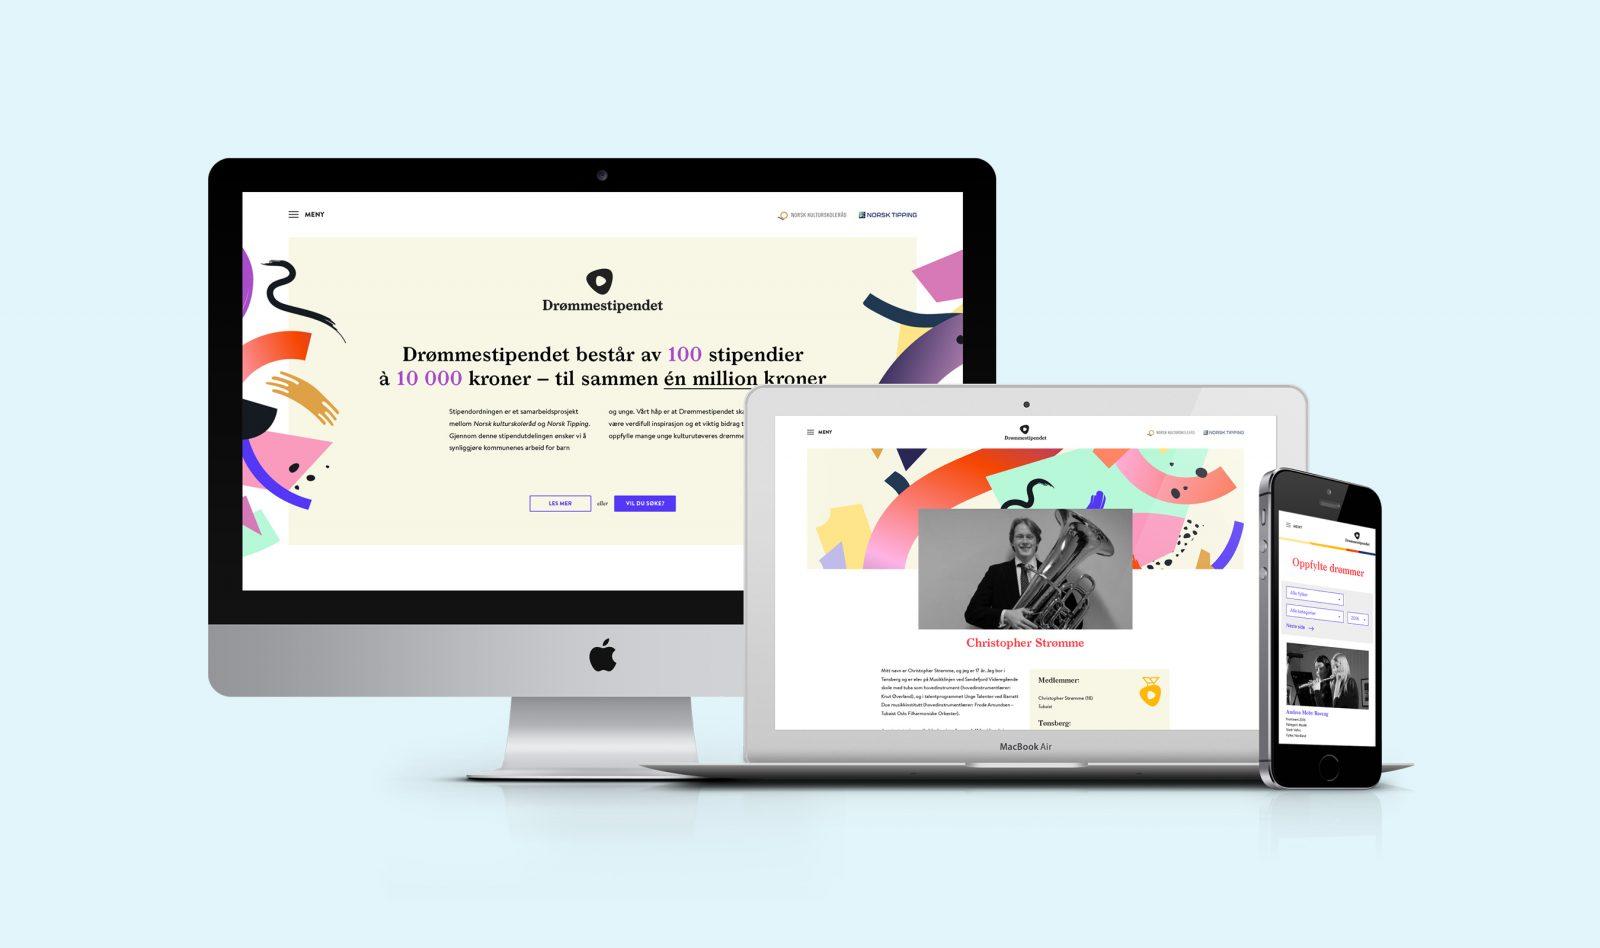 Screens from Drømmestipendets website